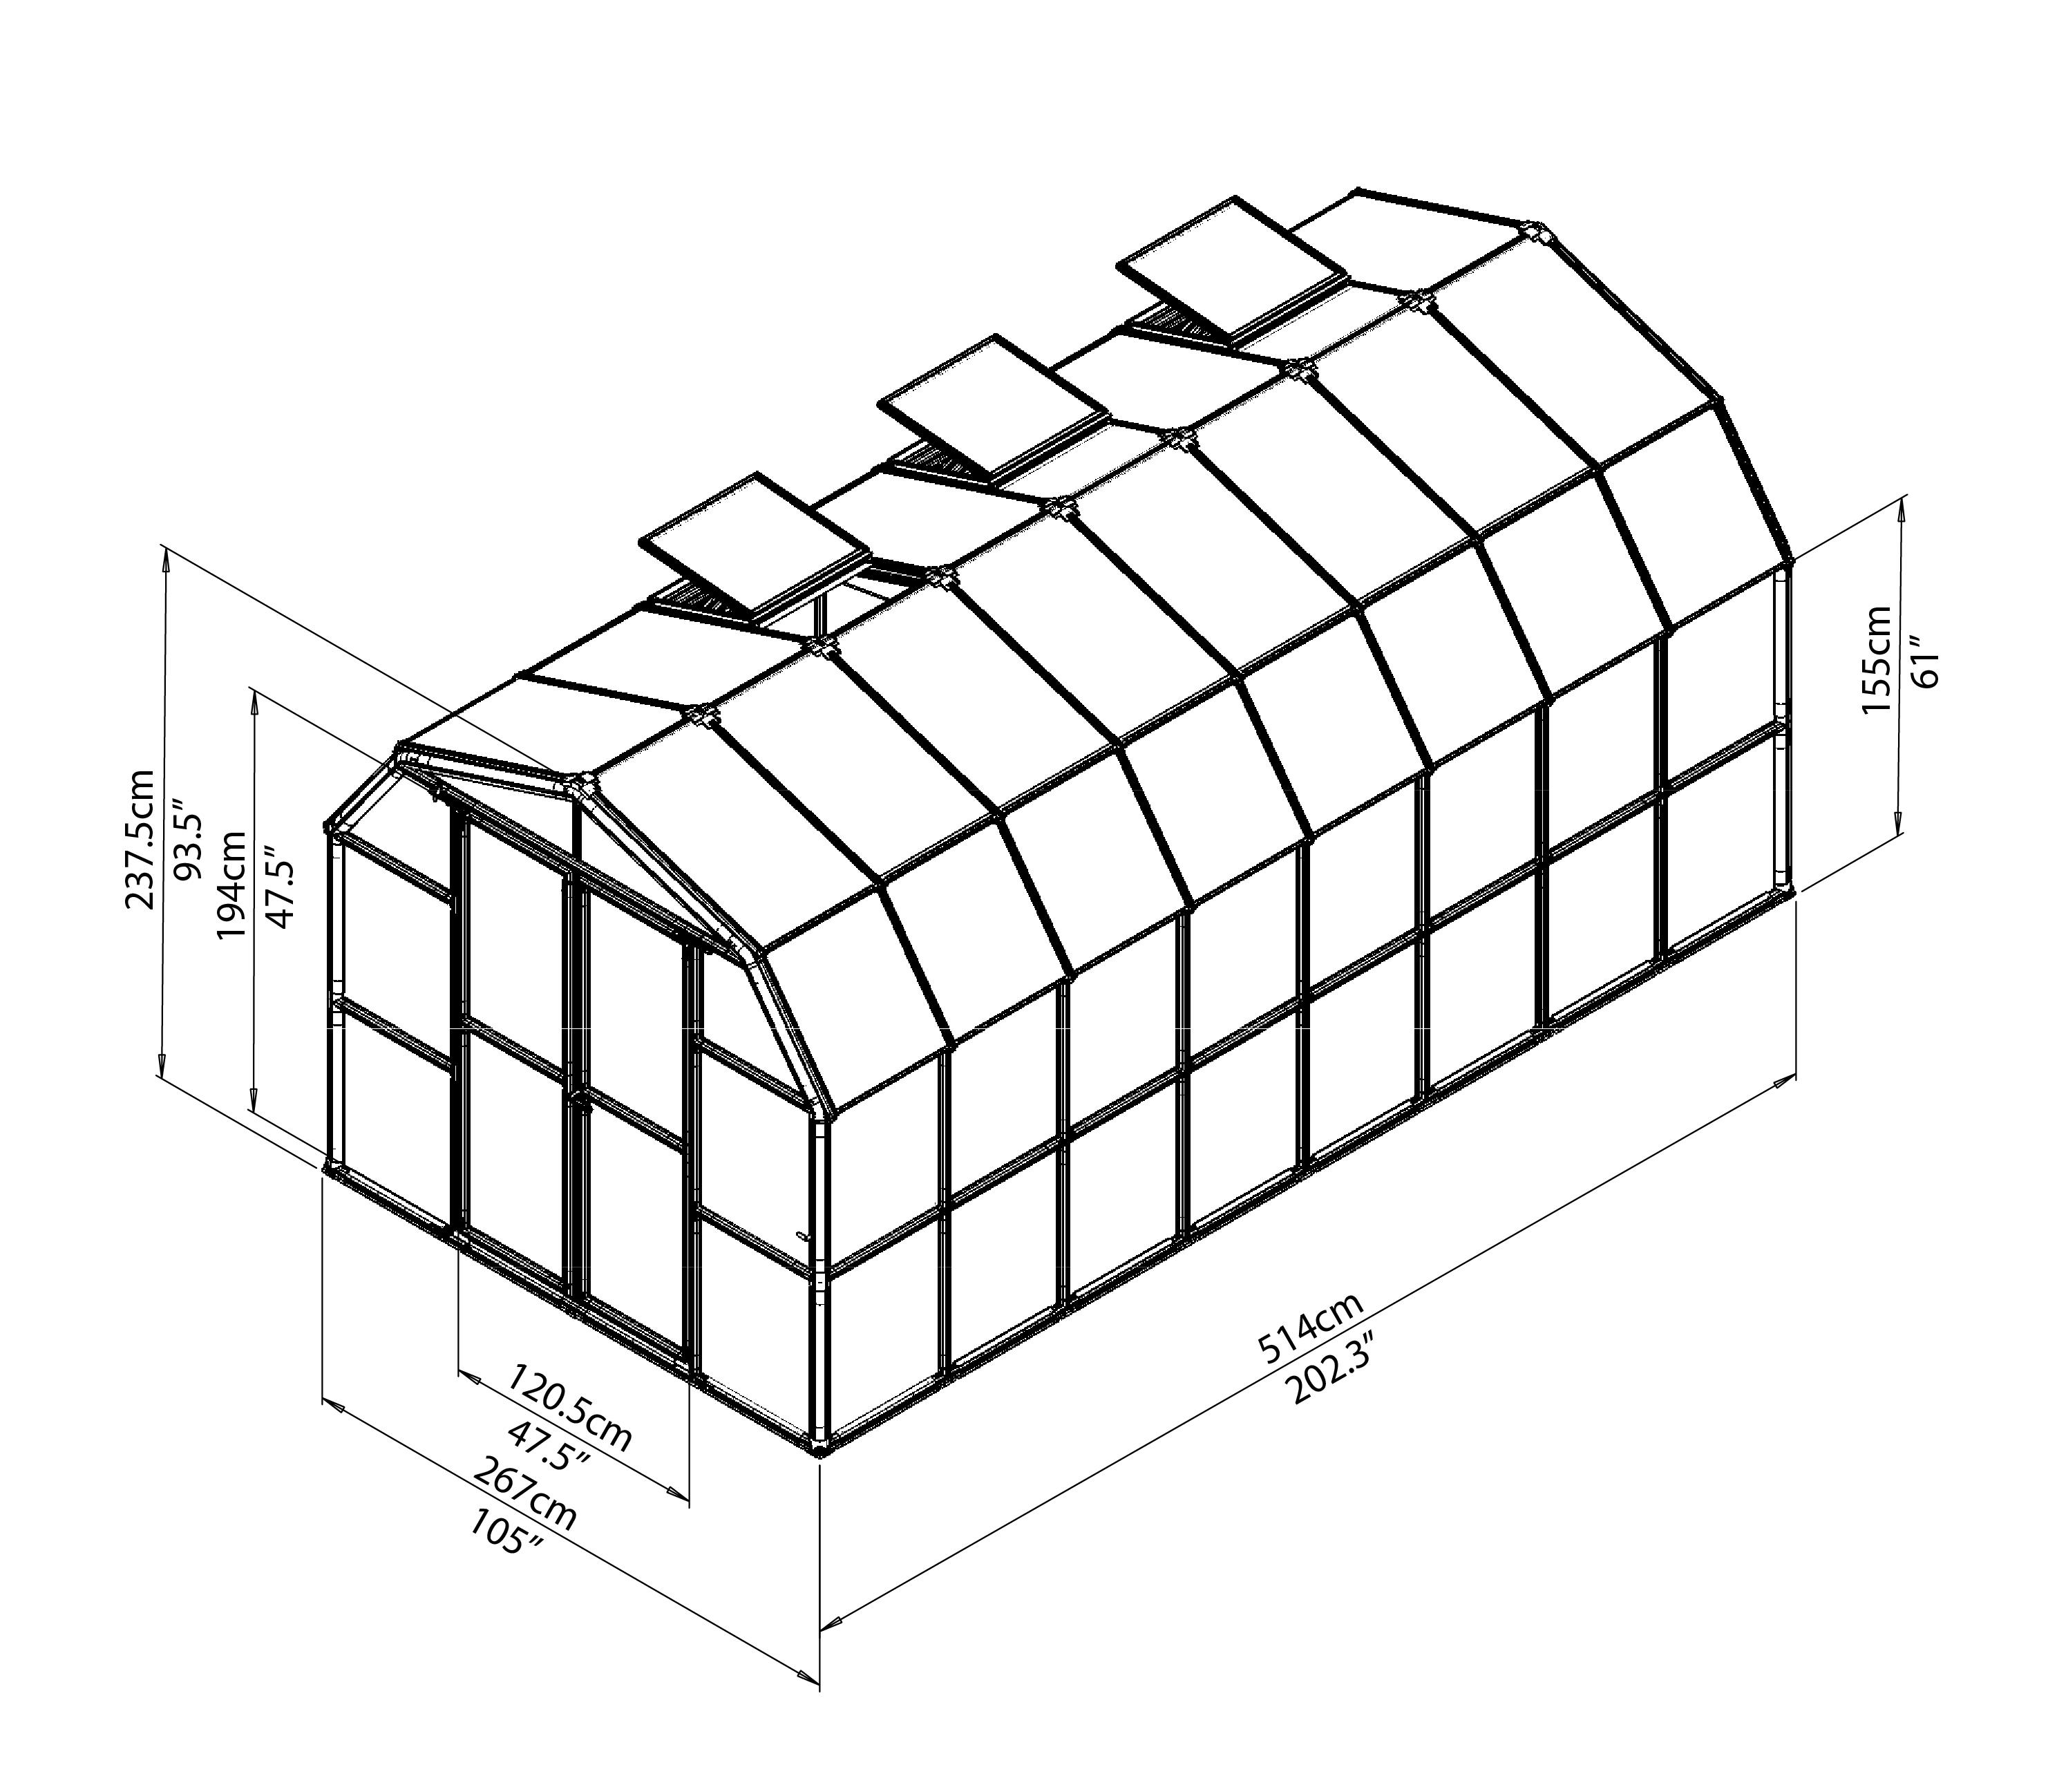 rion-greenhouses-grandgardener-prestige-opaque-8x16-drawing-isoview.jpg